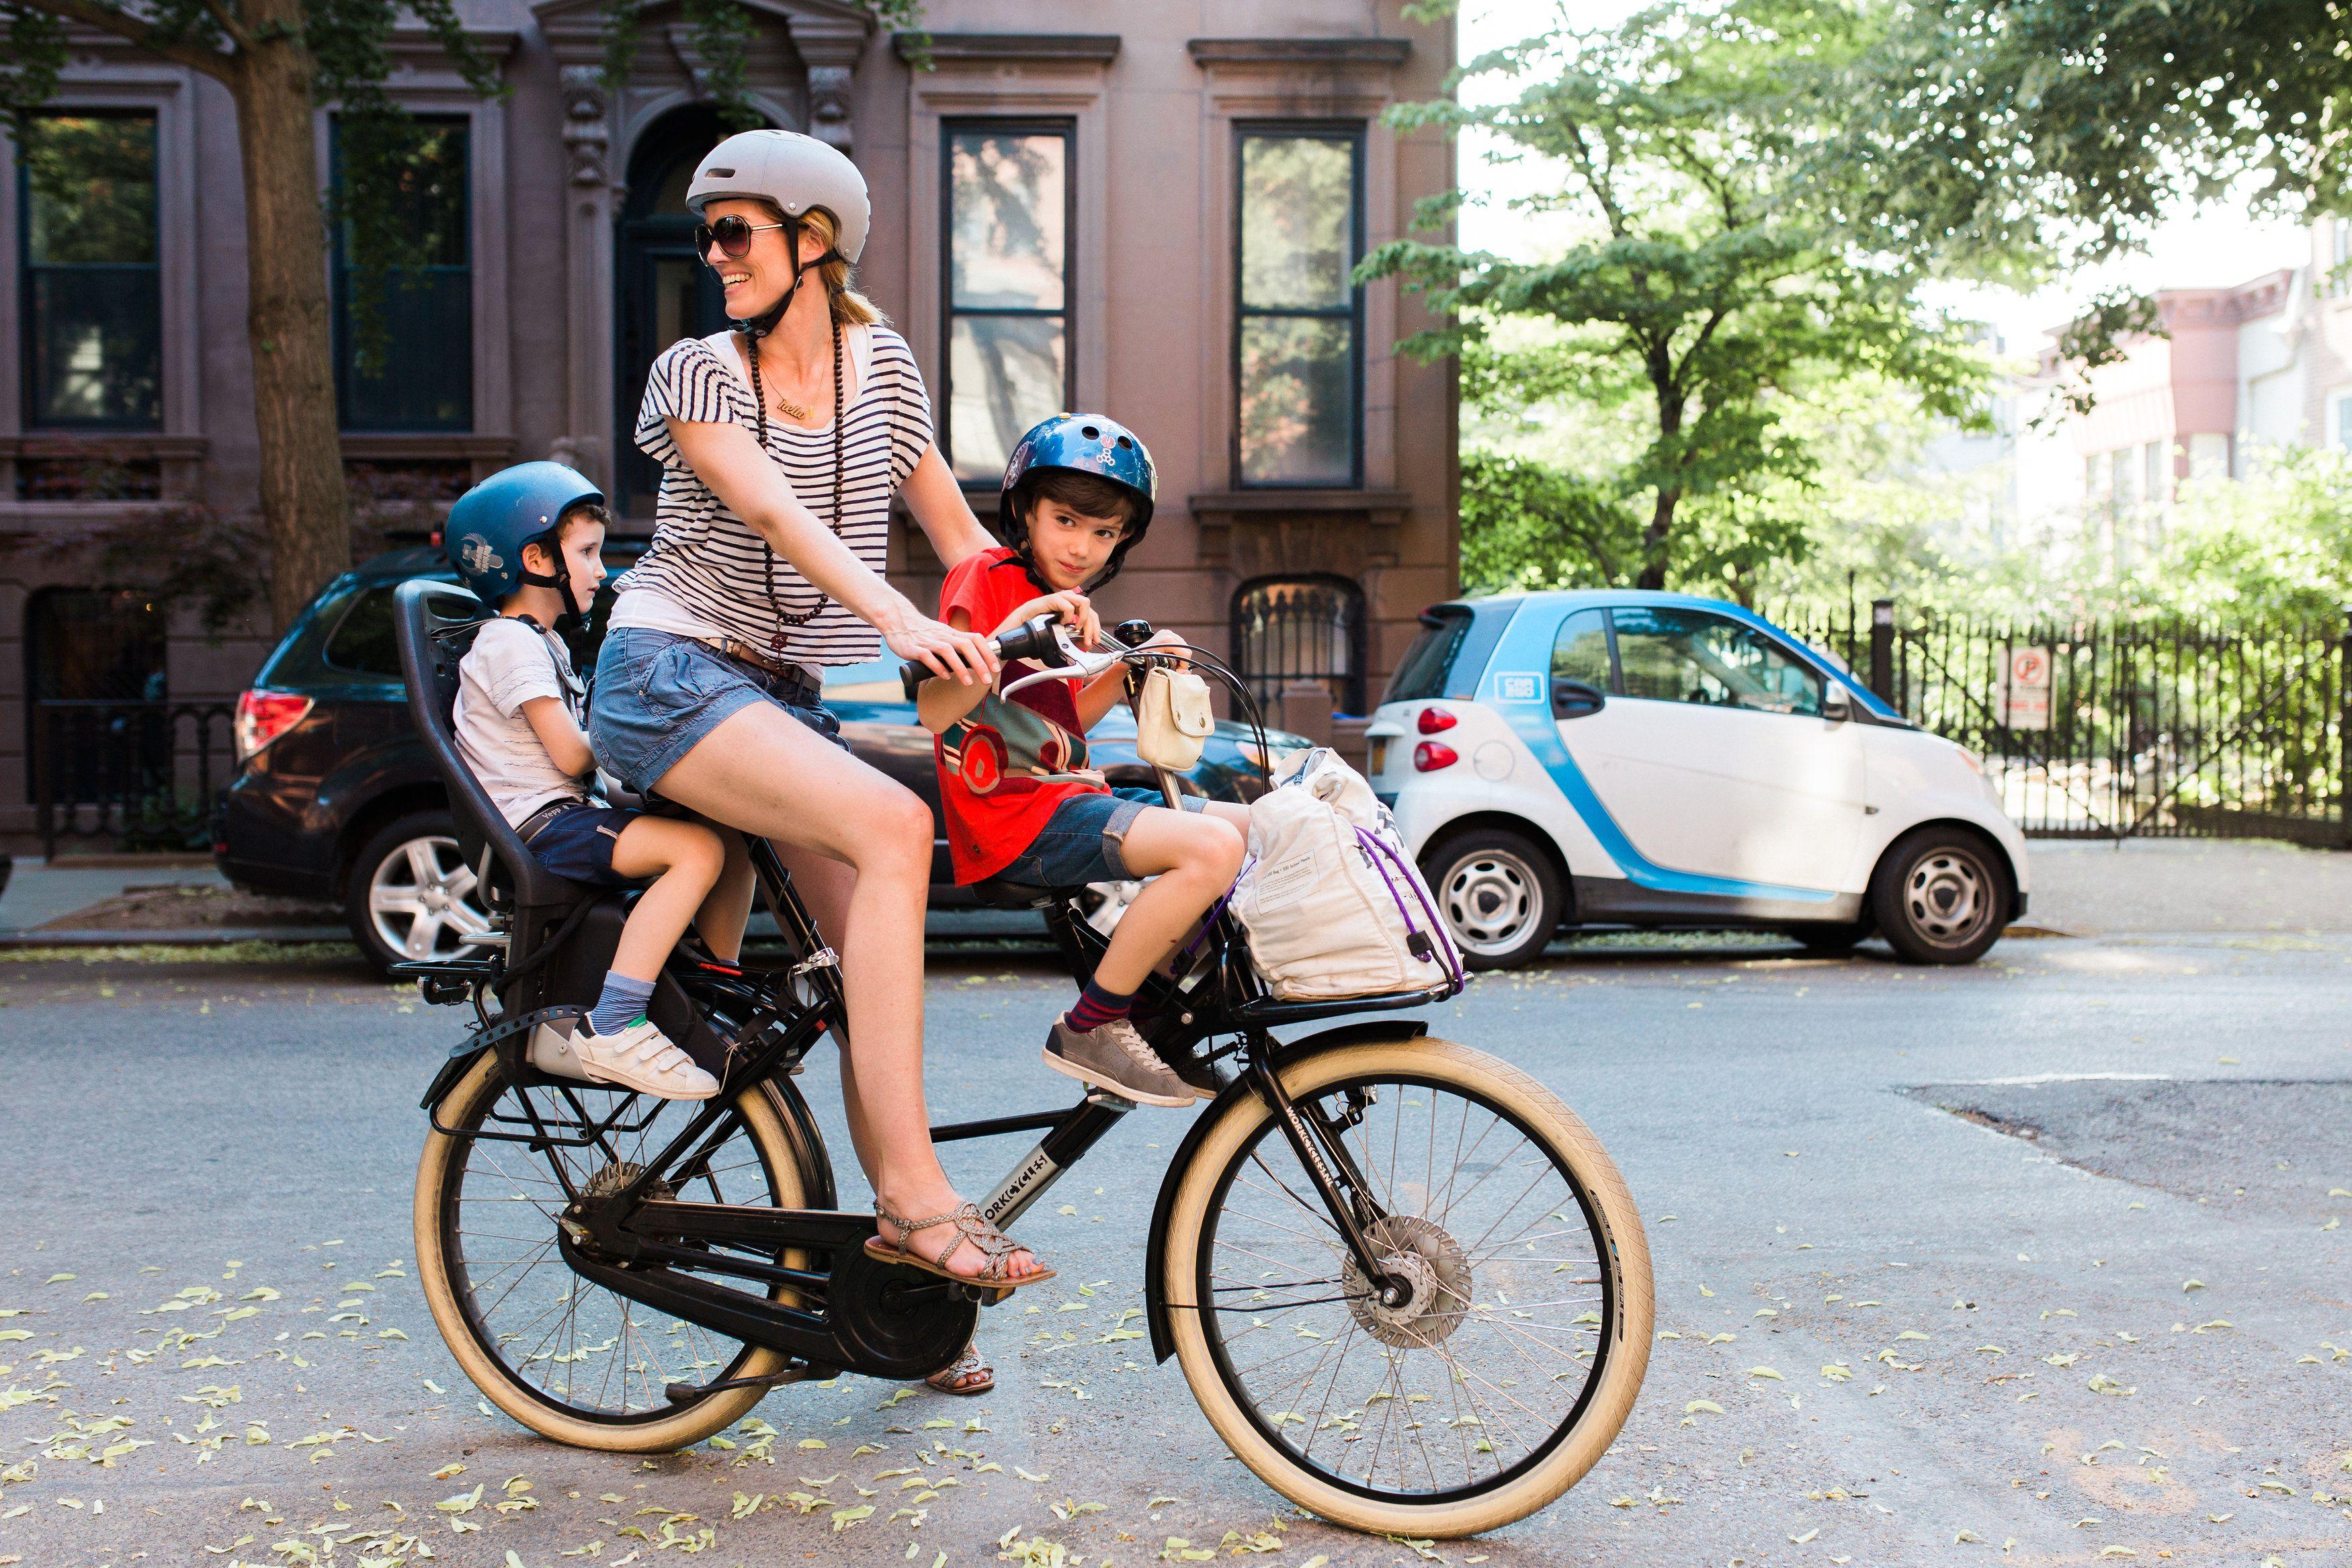 5 Awesome Family Bikes Family Bike Baby Bike Child Bike Seat